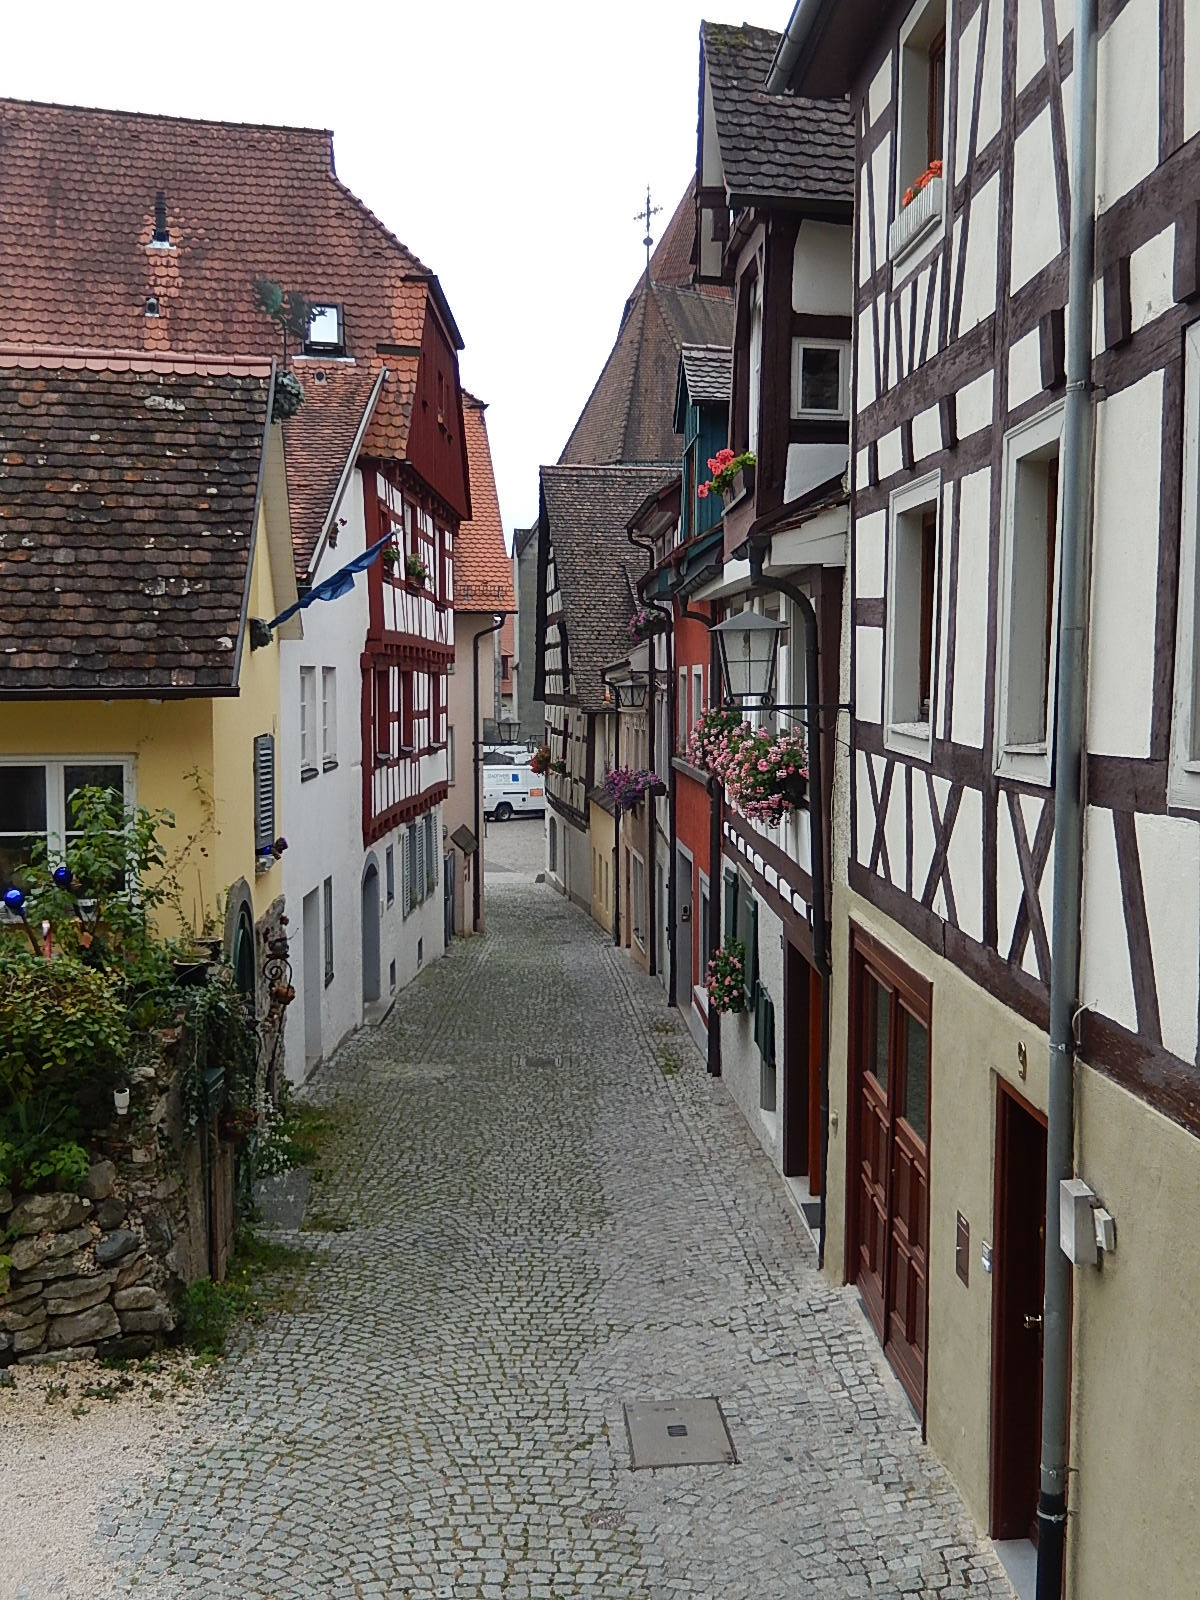 'Tudor' Lane